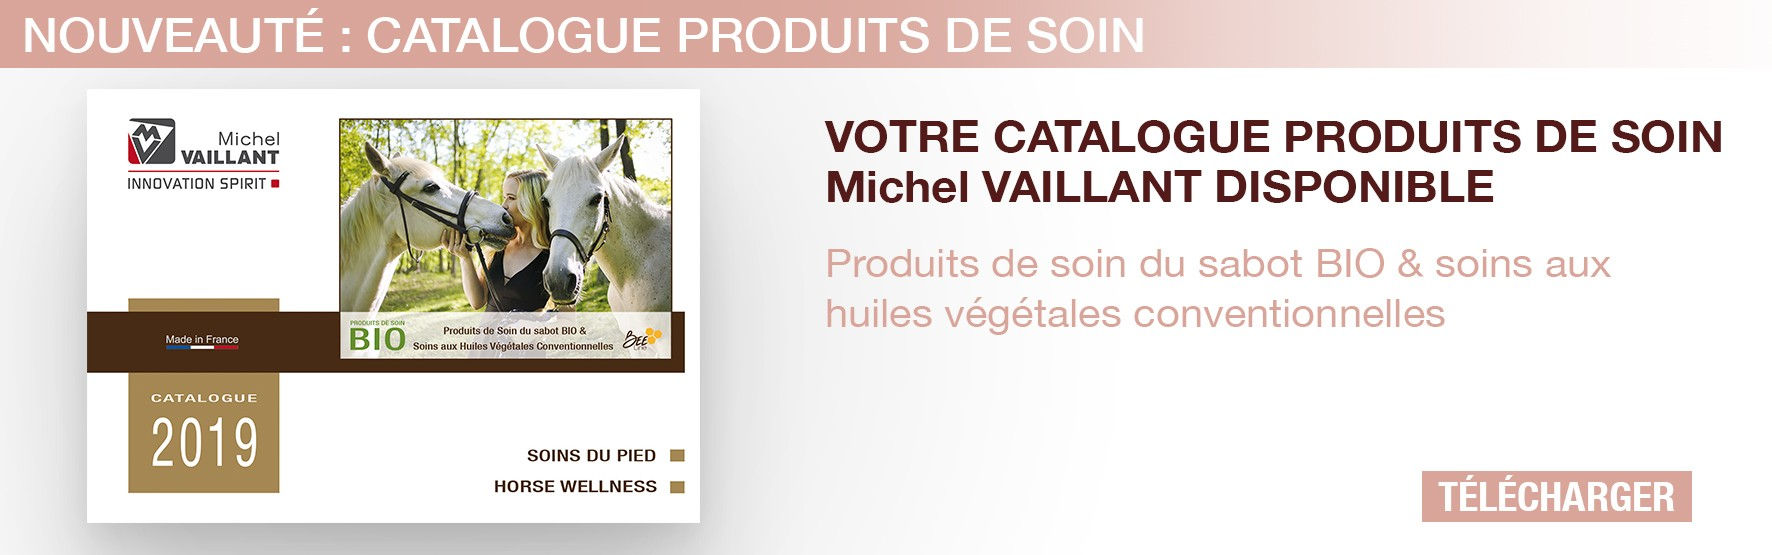 Michel Vaillant Equitation - Soins chevaux - Phytotherapie cheval - Bio cheval